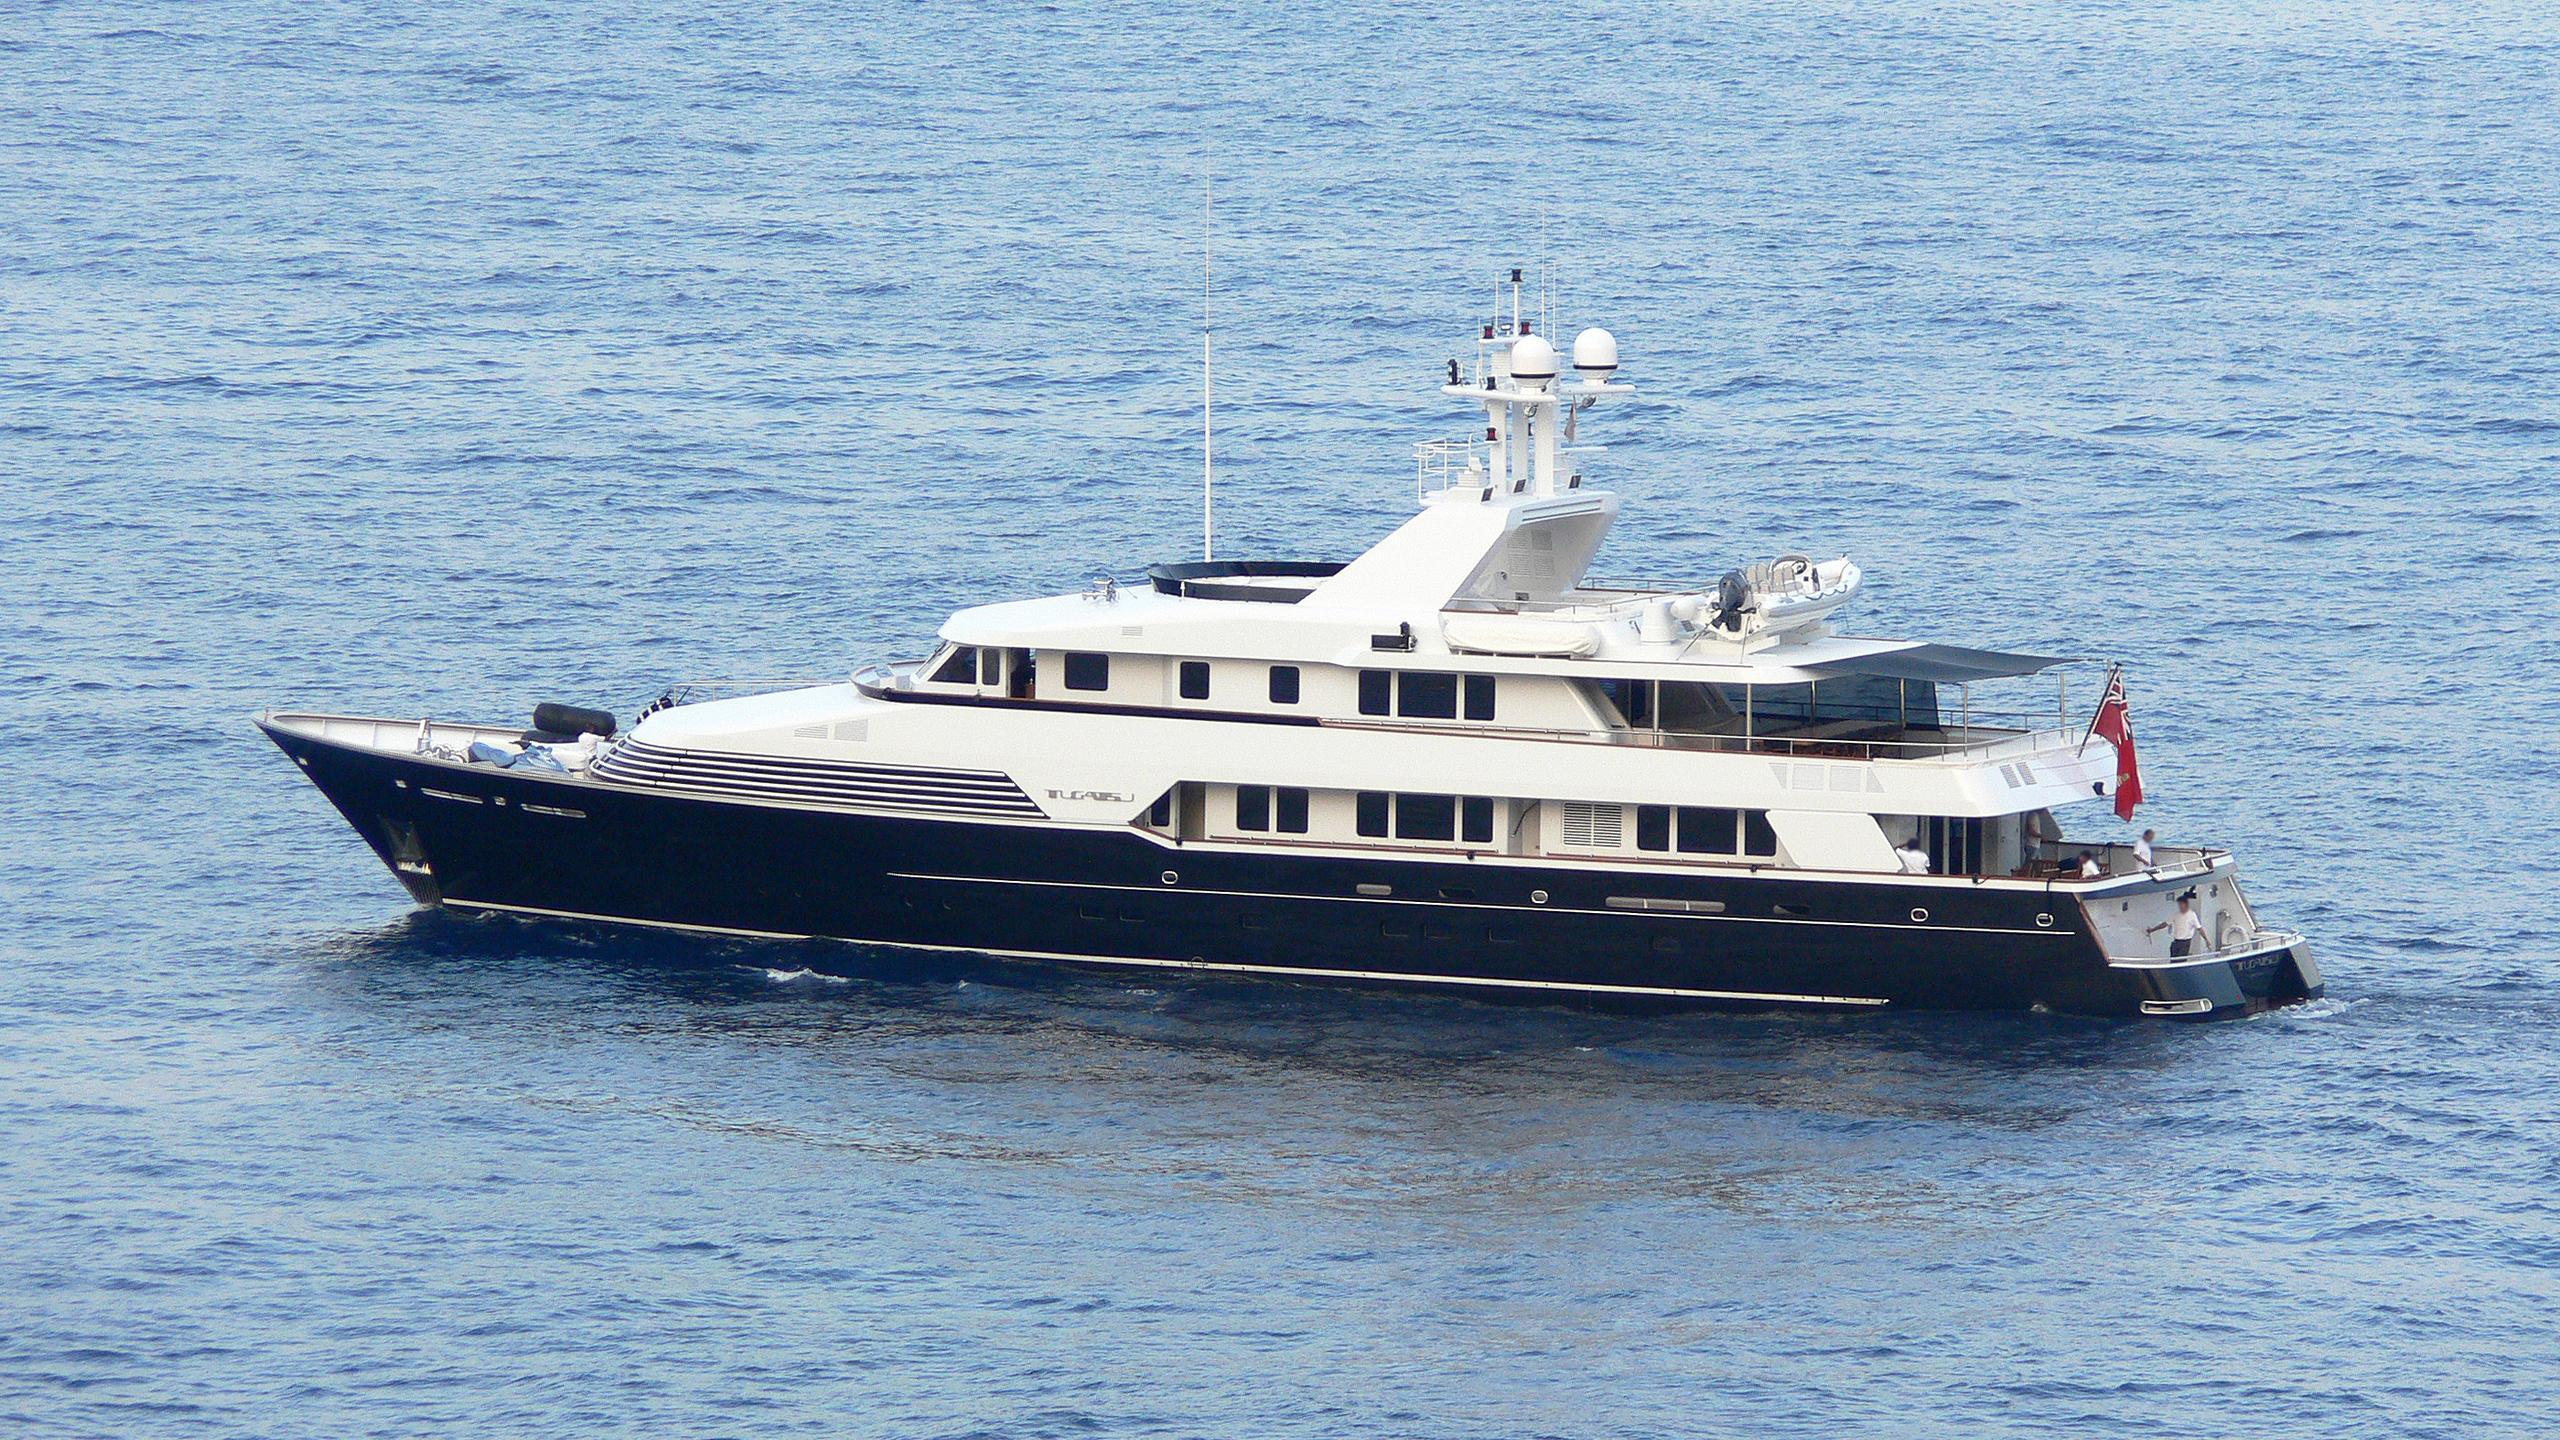 tugatsu-motor-yacht-feadhsip-1989-45m-half-profile